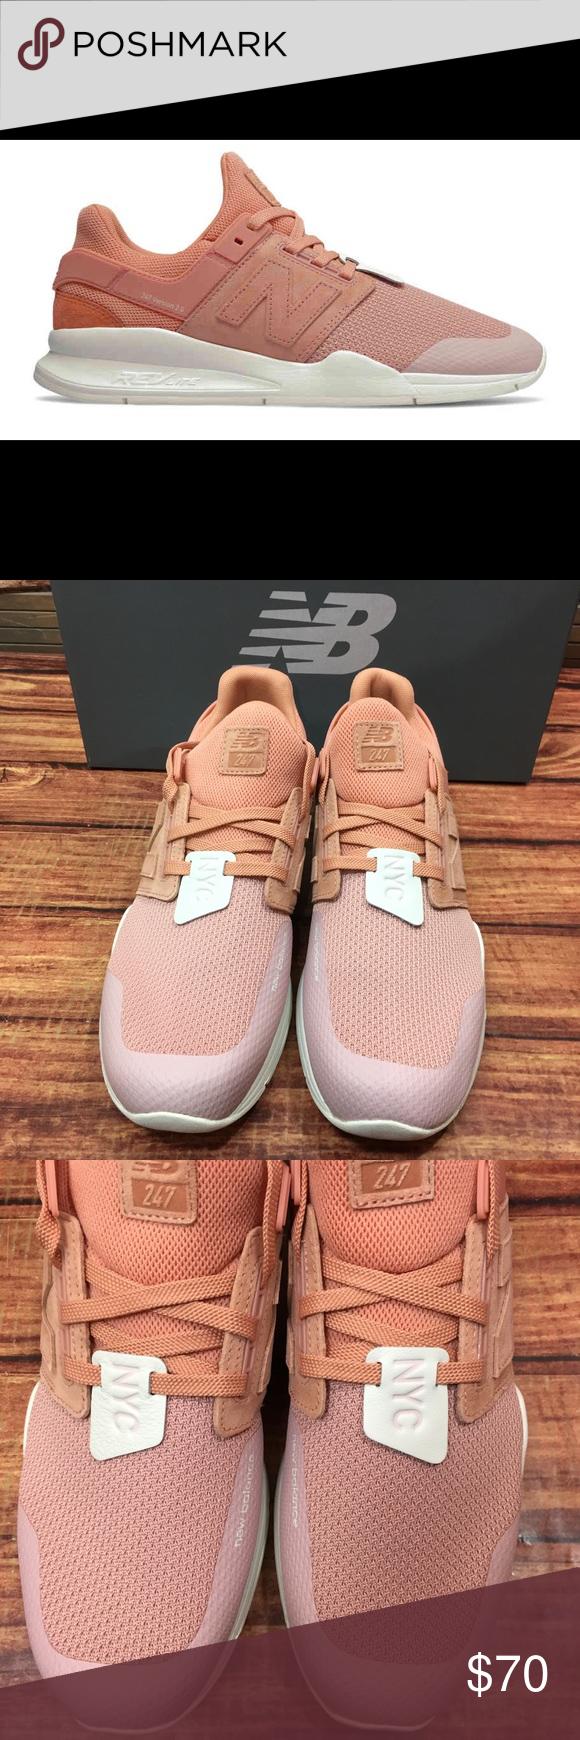 Empleado Hasta origen  New Balance 247 Time Zone Peachskin/Mellow Rose   New balance pink, New  balance shoes, New balance